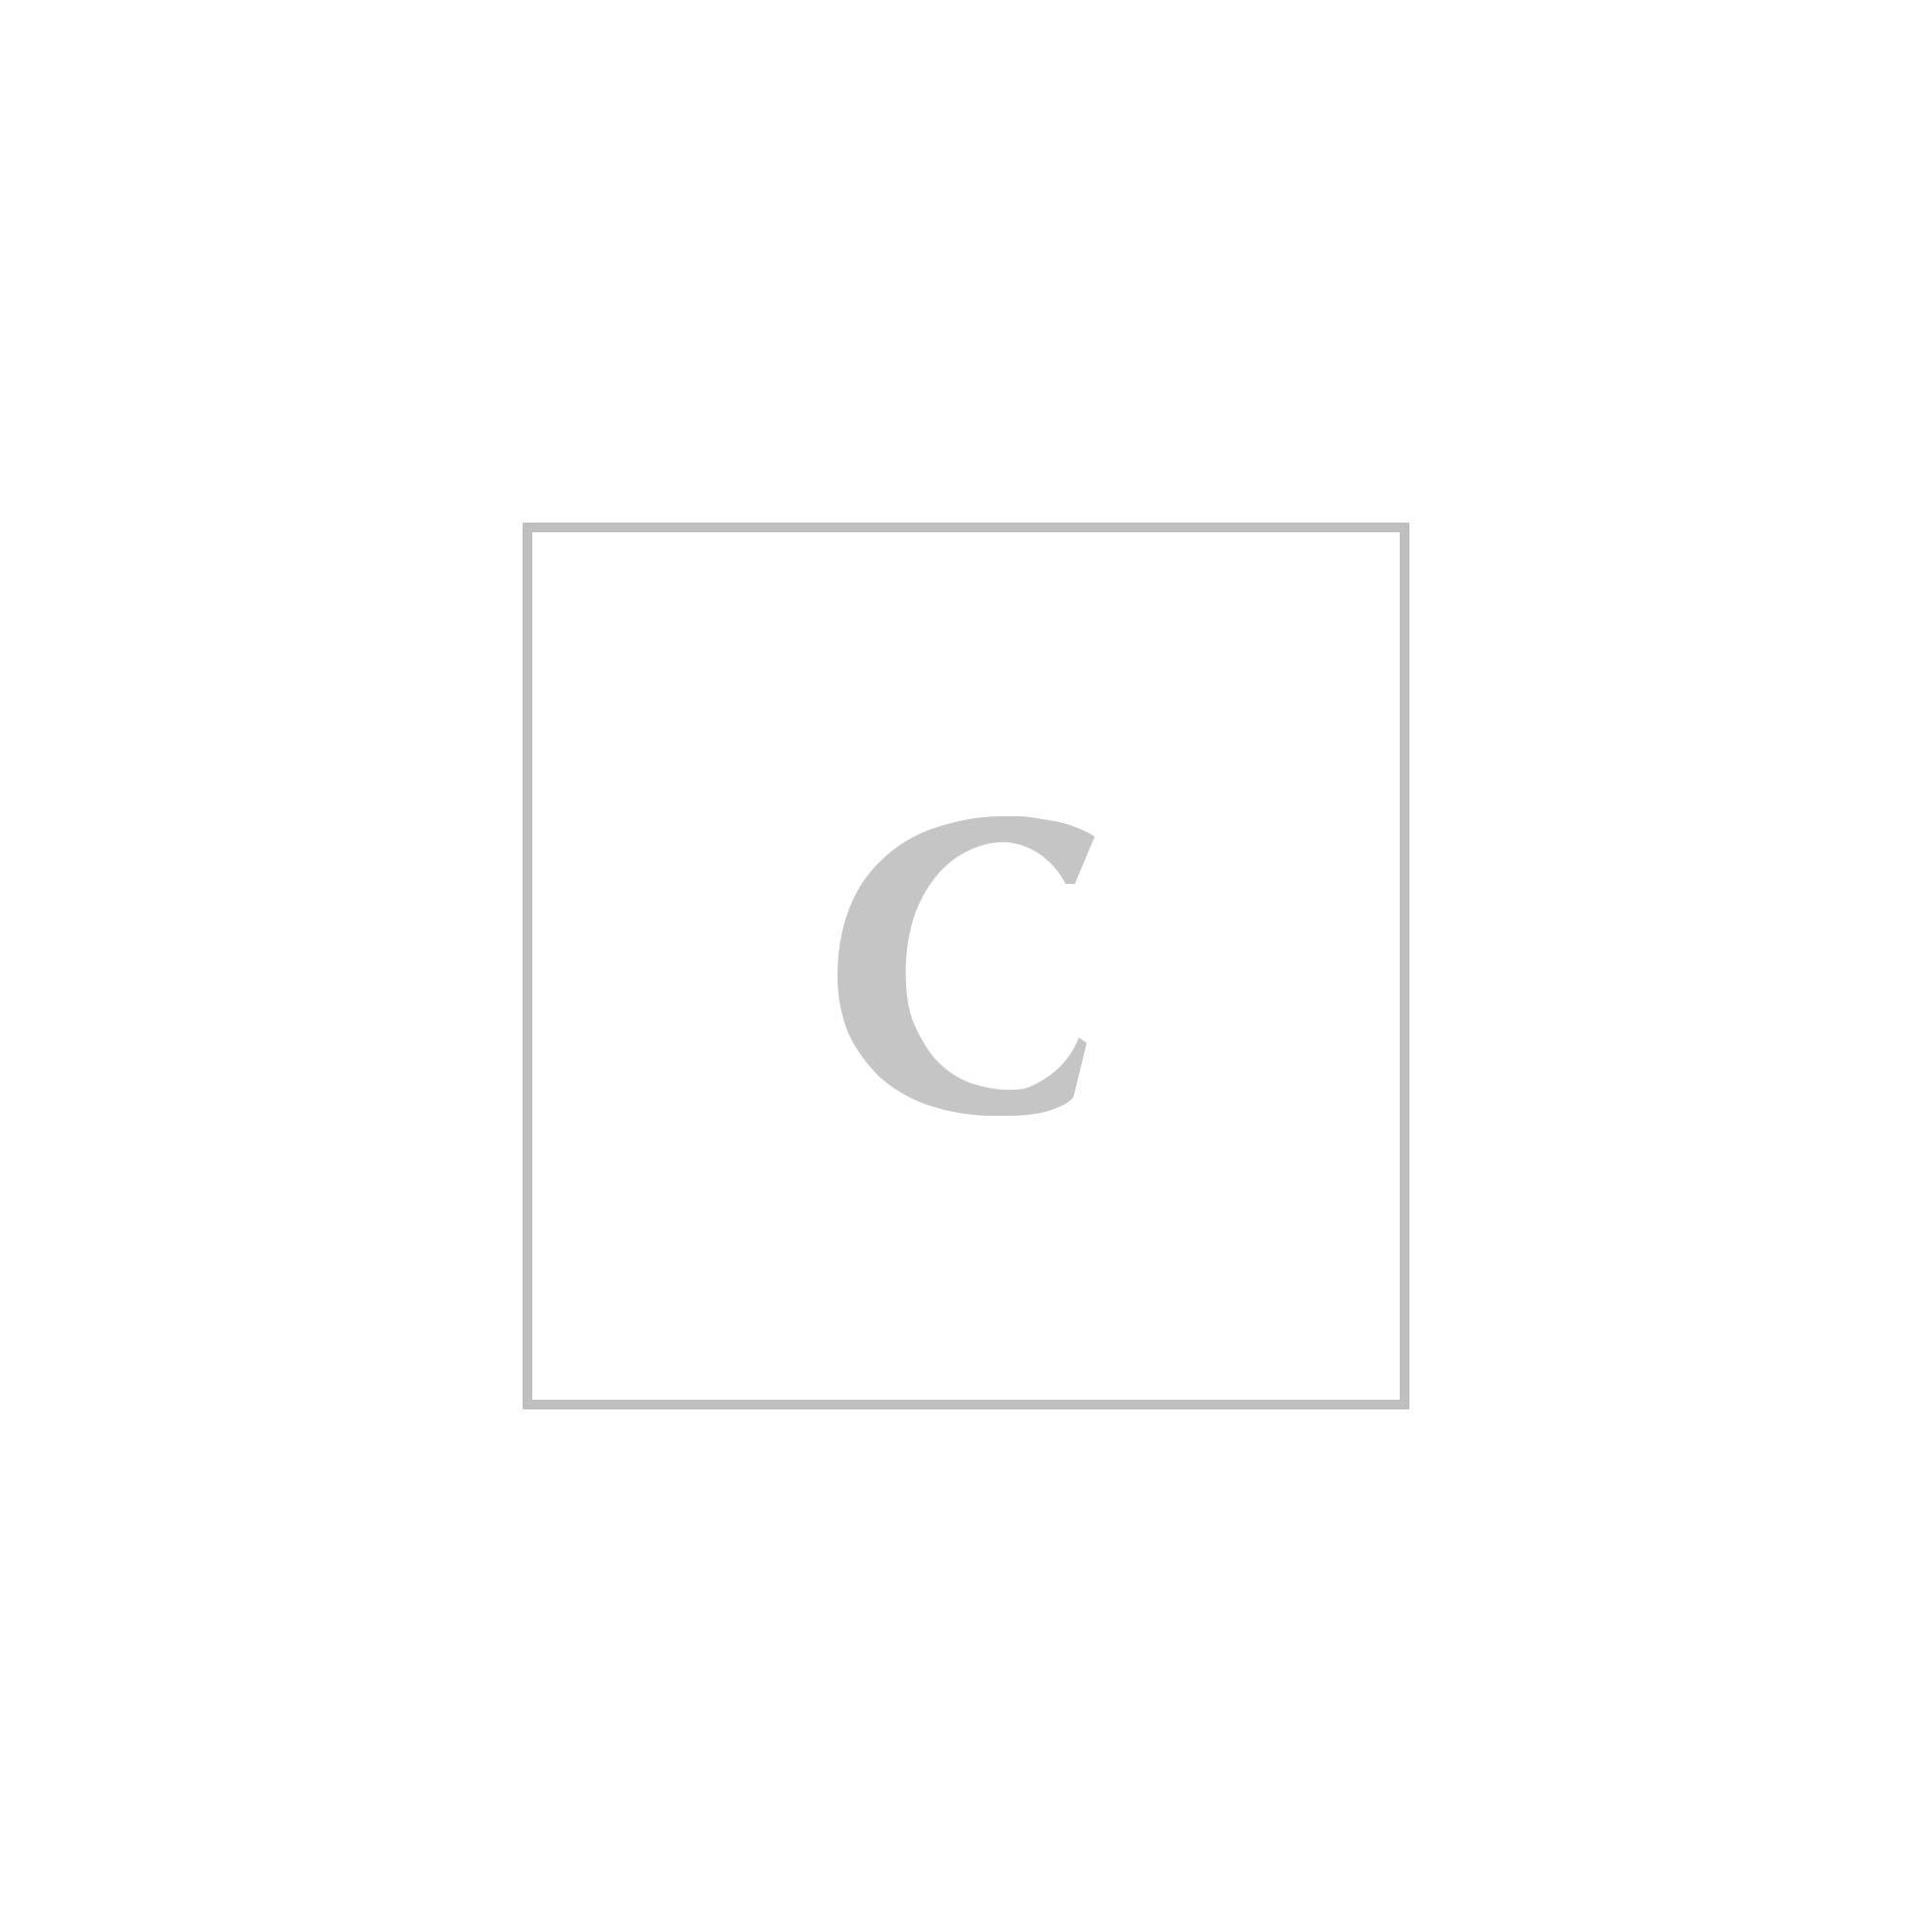 Saint laurent ysl borsa tracolla monogramme portachiavi